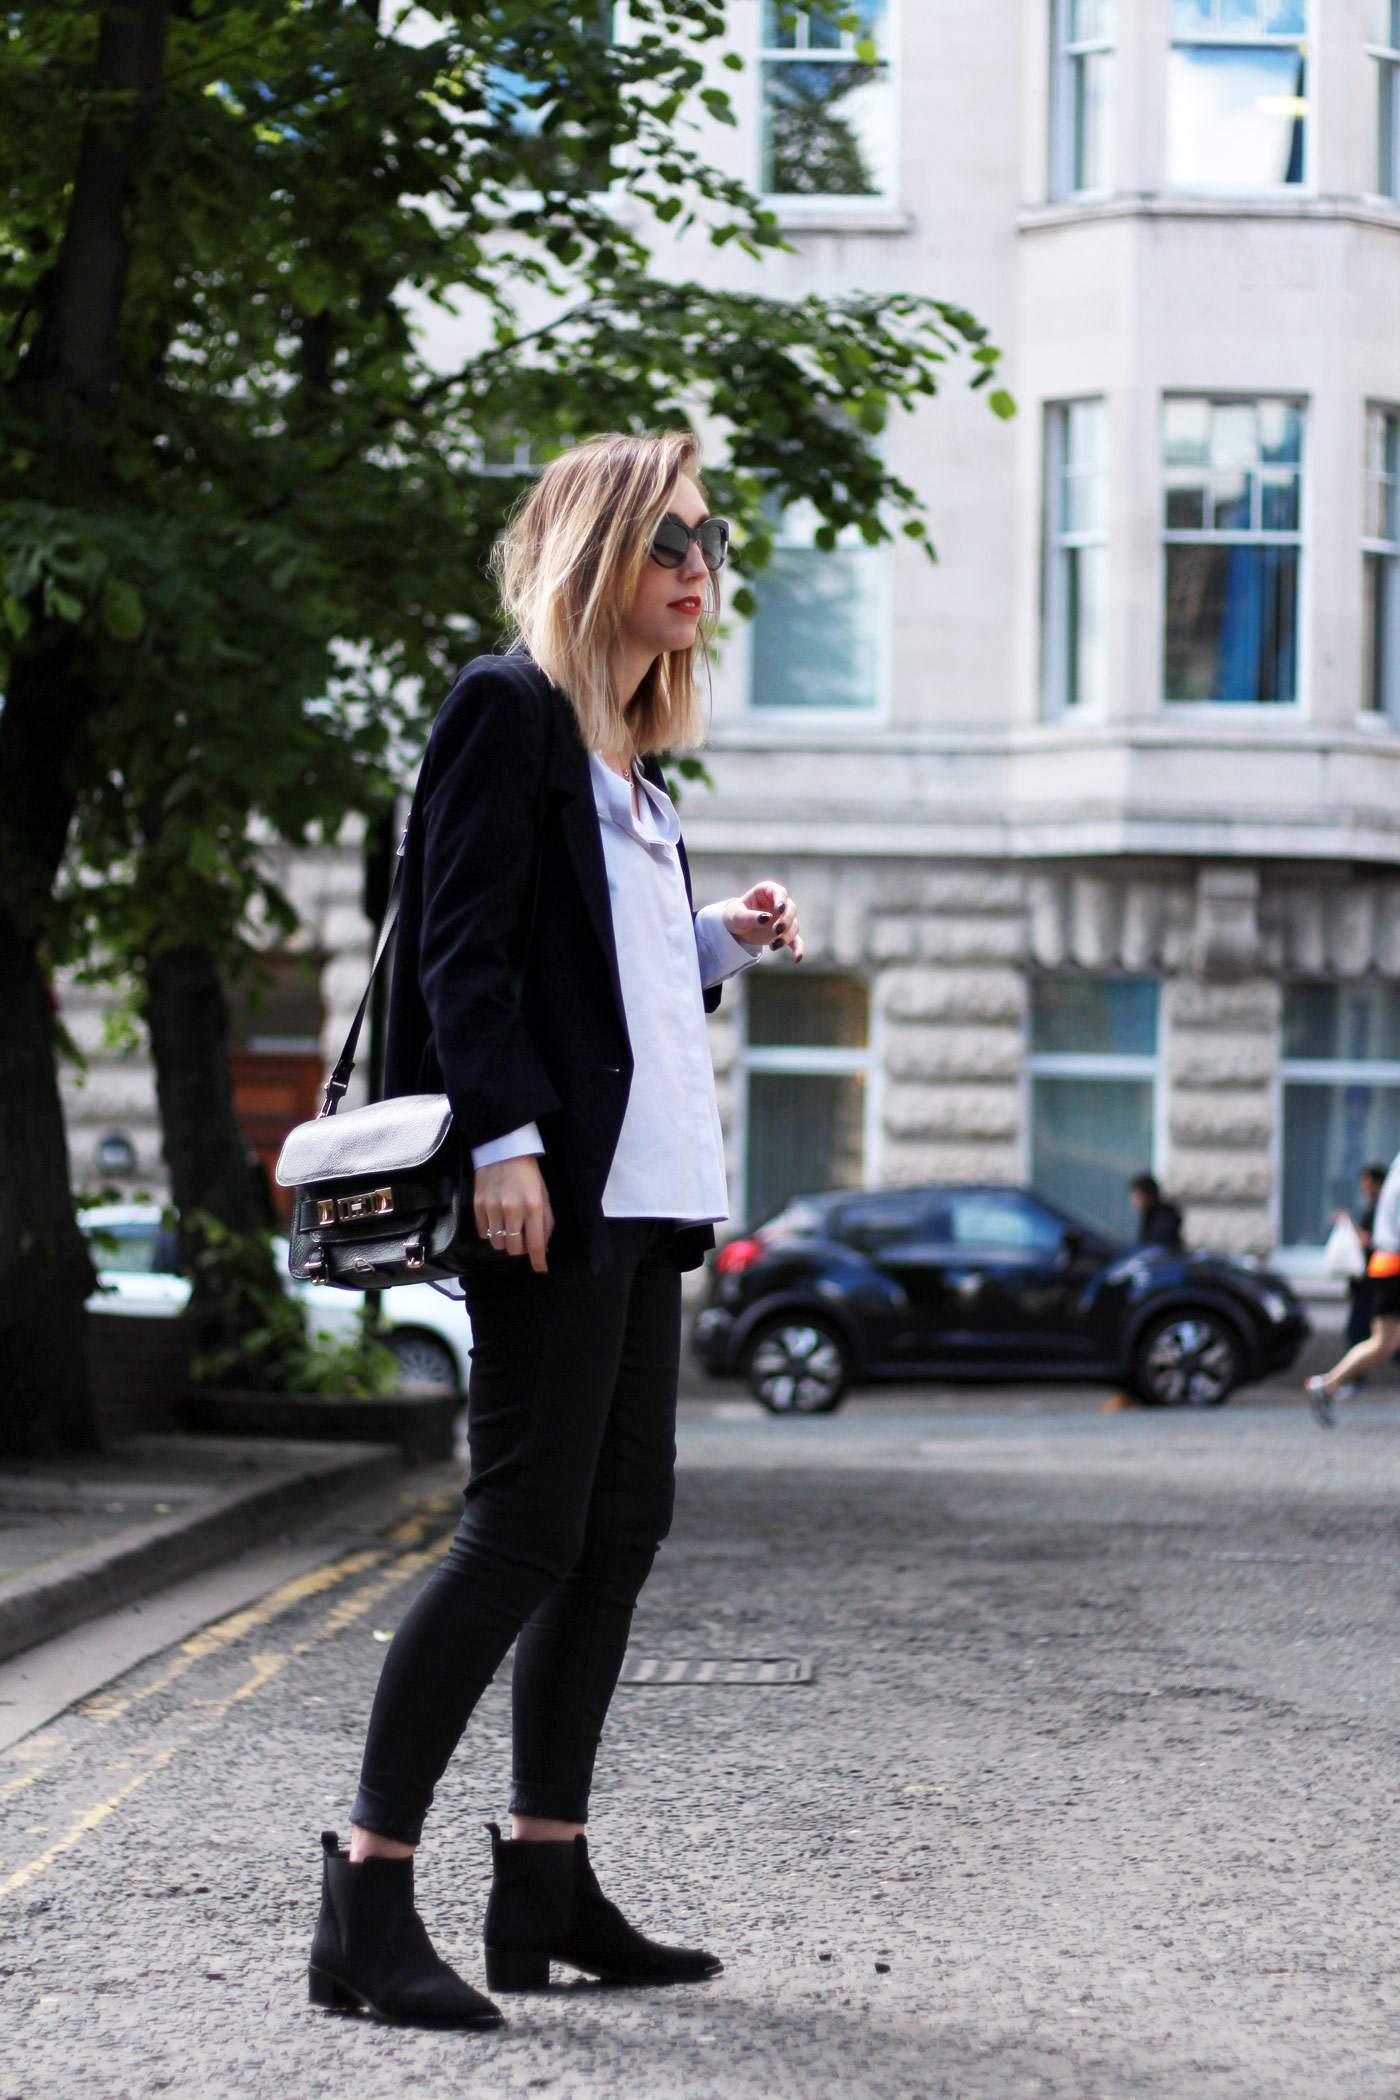 acne-jensen-boots-M&S-alexa-chung-ada-blazer-outfit-9